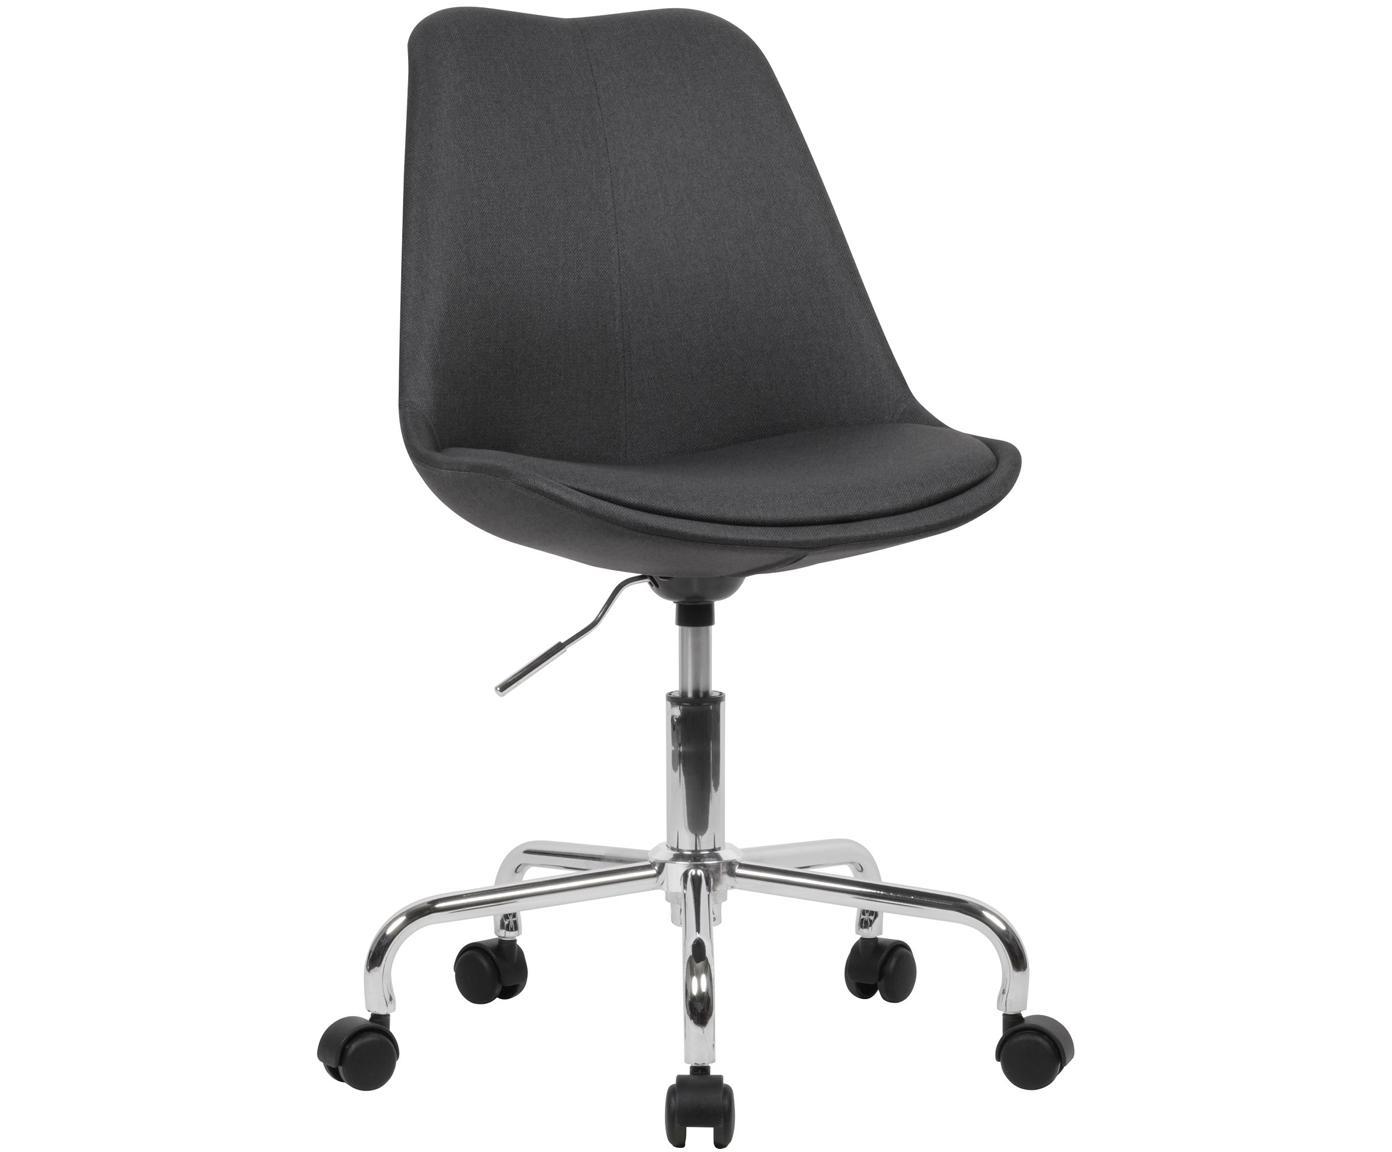 Bürodrehstuhl Lenka, höhenverstellbar, Bezug: Polyester, Gestell: Metall, verchromt, Webstoff Anthrazit, B 65 x T 56 cm